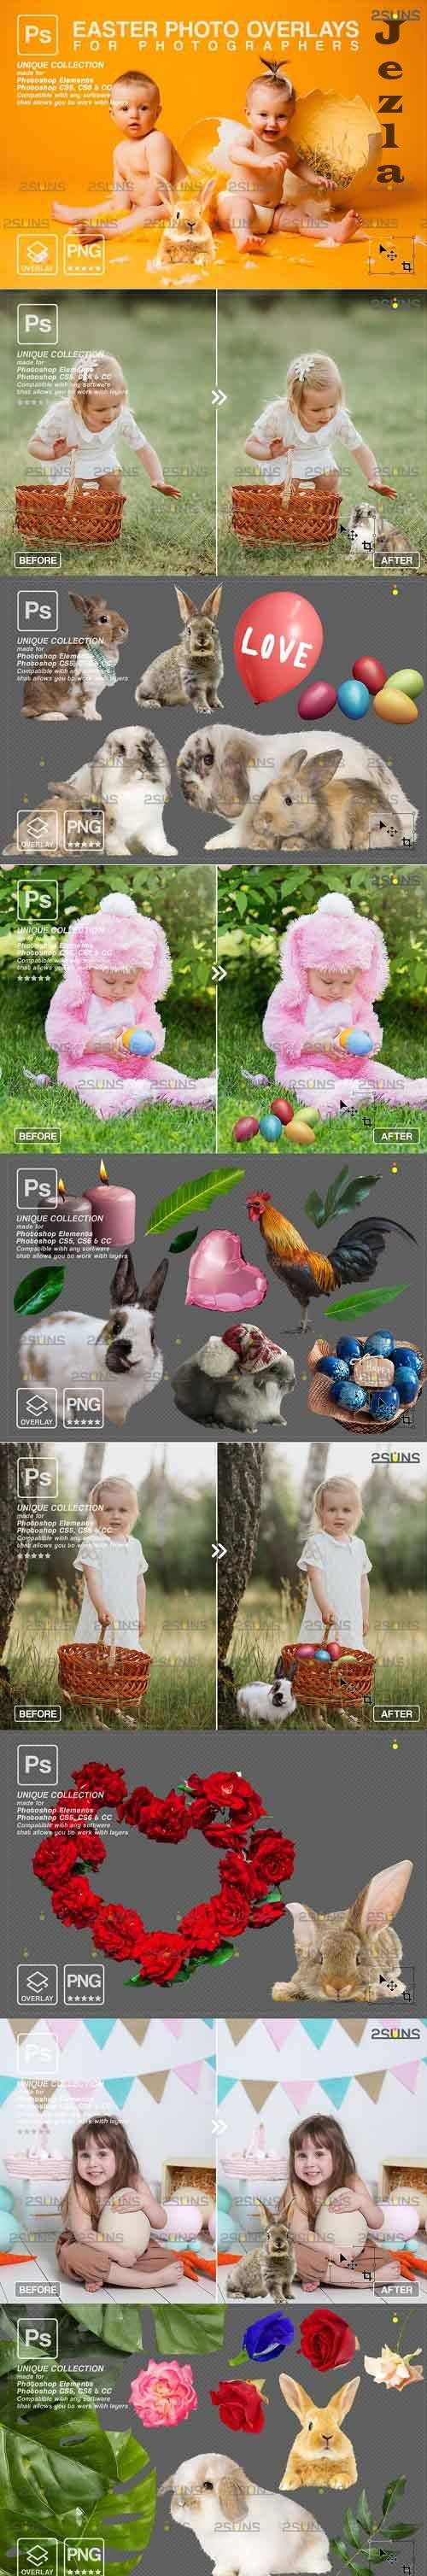 PHSP overlay Easter bunny overlay - 1222129